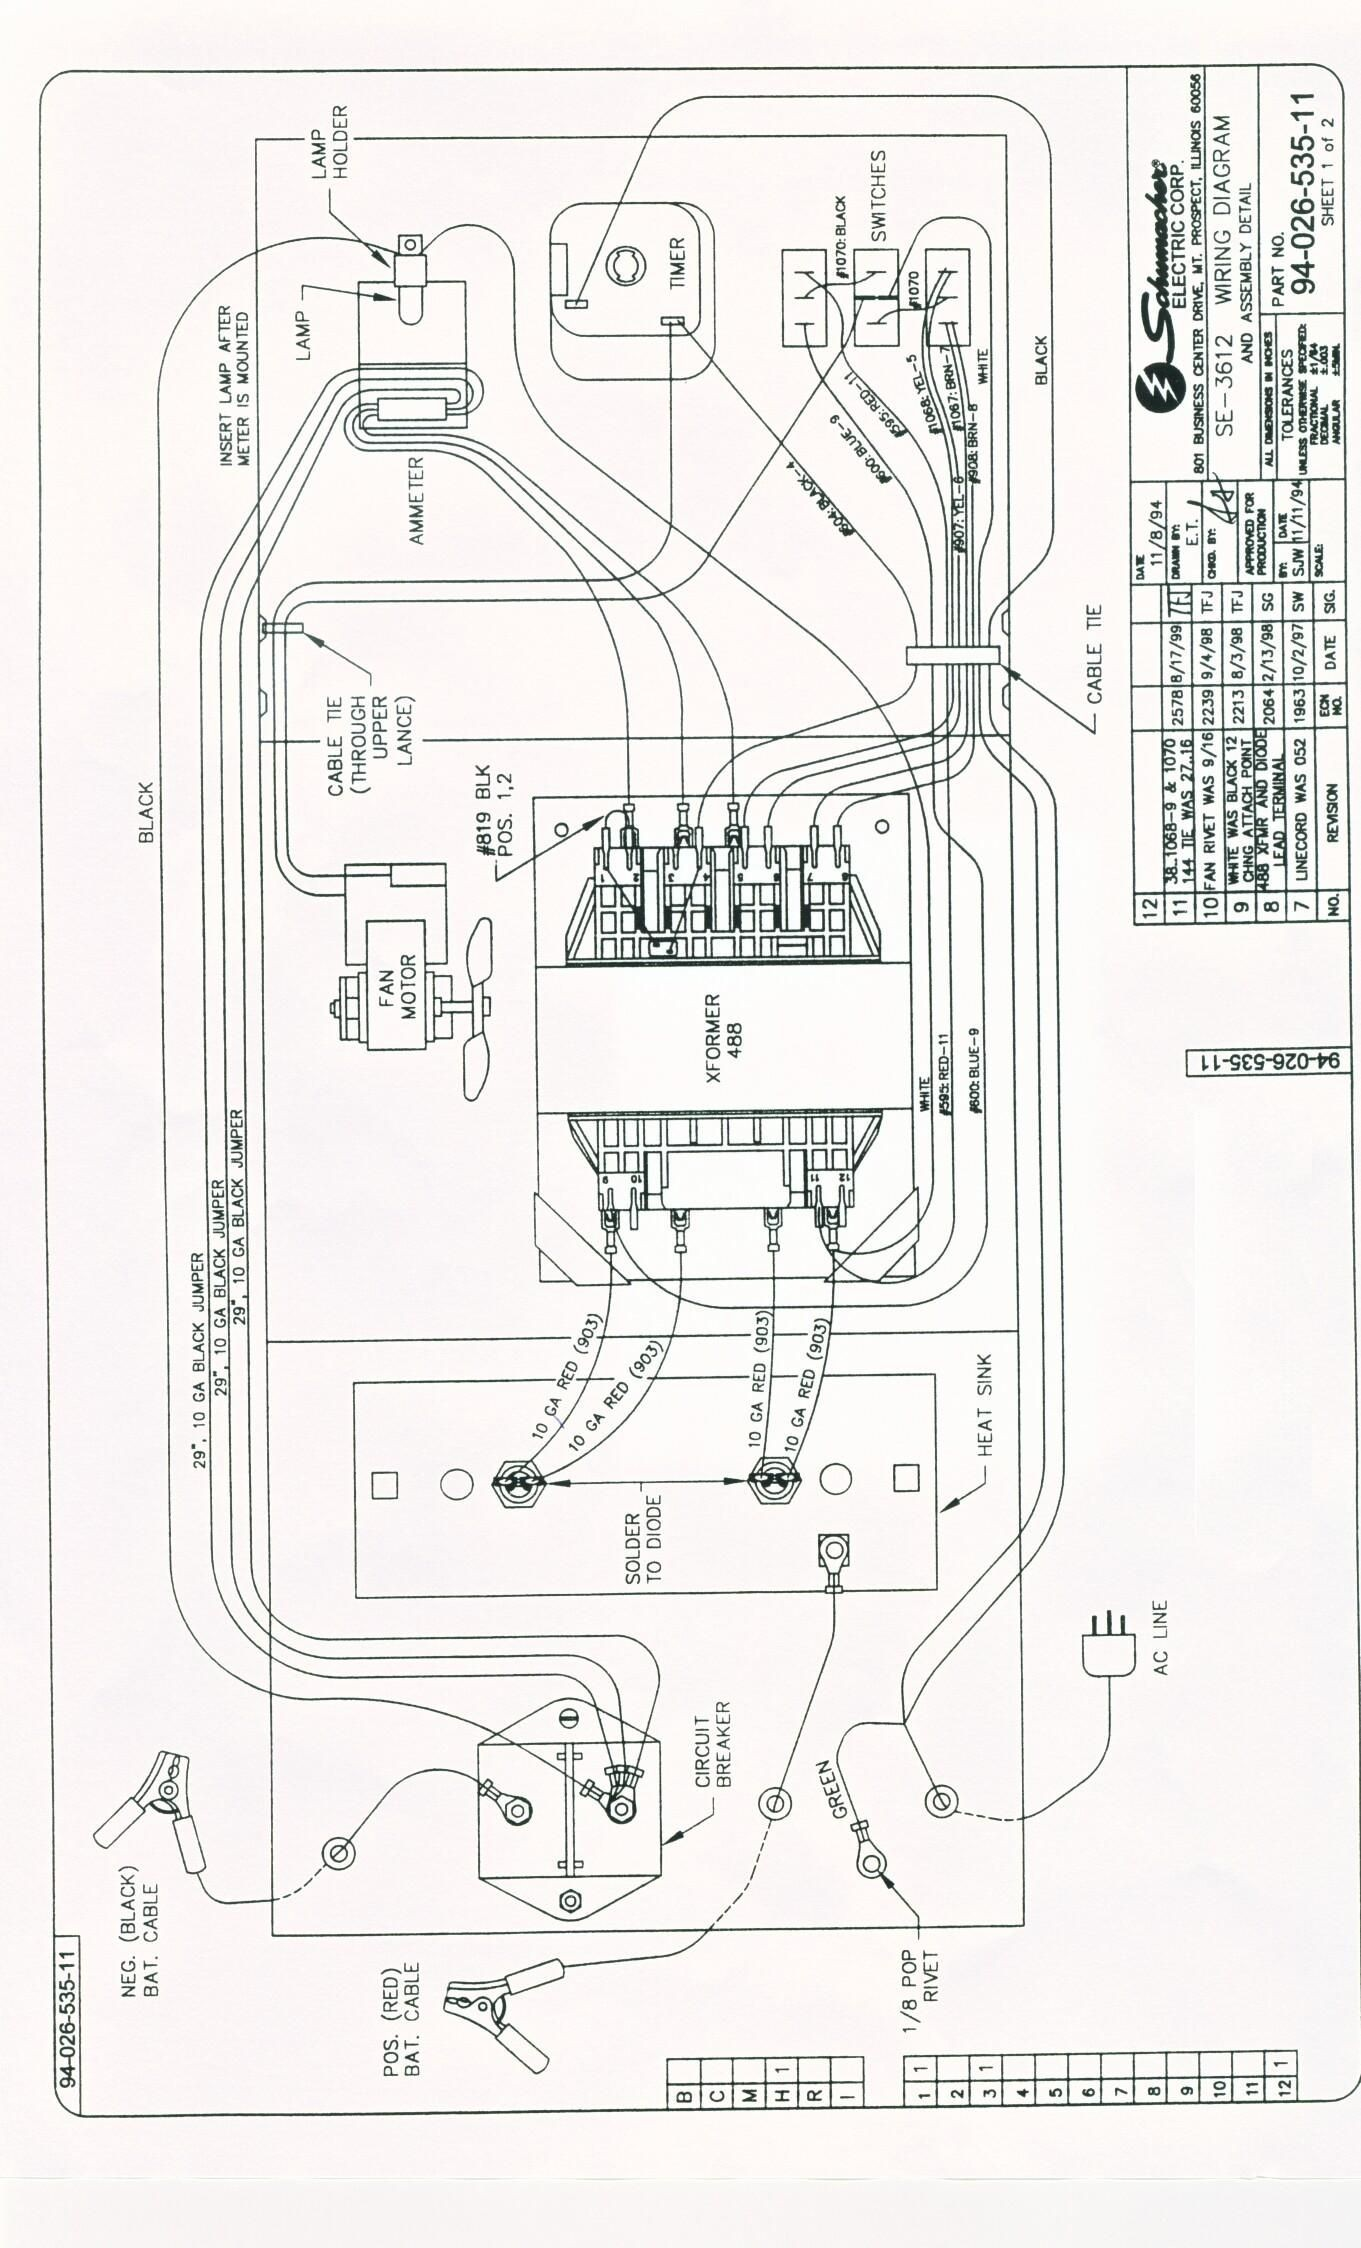 Car Battery Charger Circuit Diagram Schumacher Battery Charger Wiring Diagram Charger Of Car Battery Charger Circuit Diagram